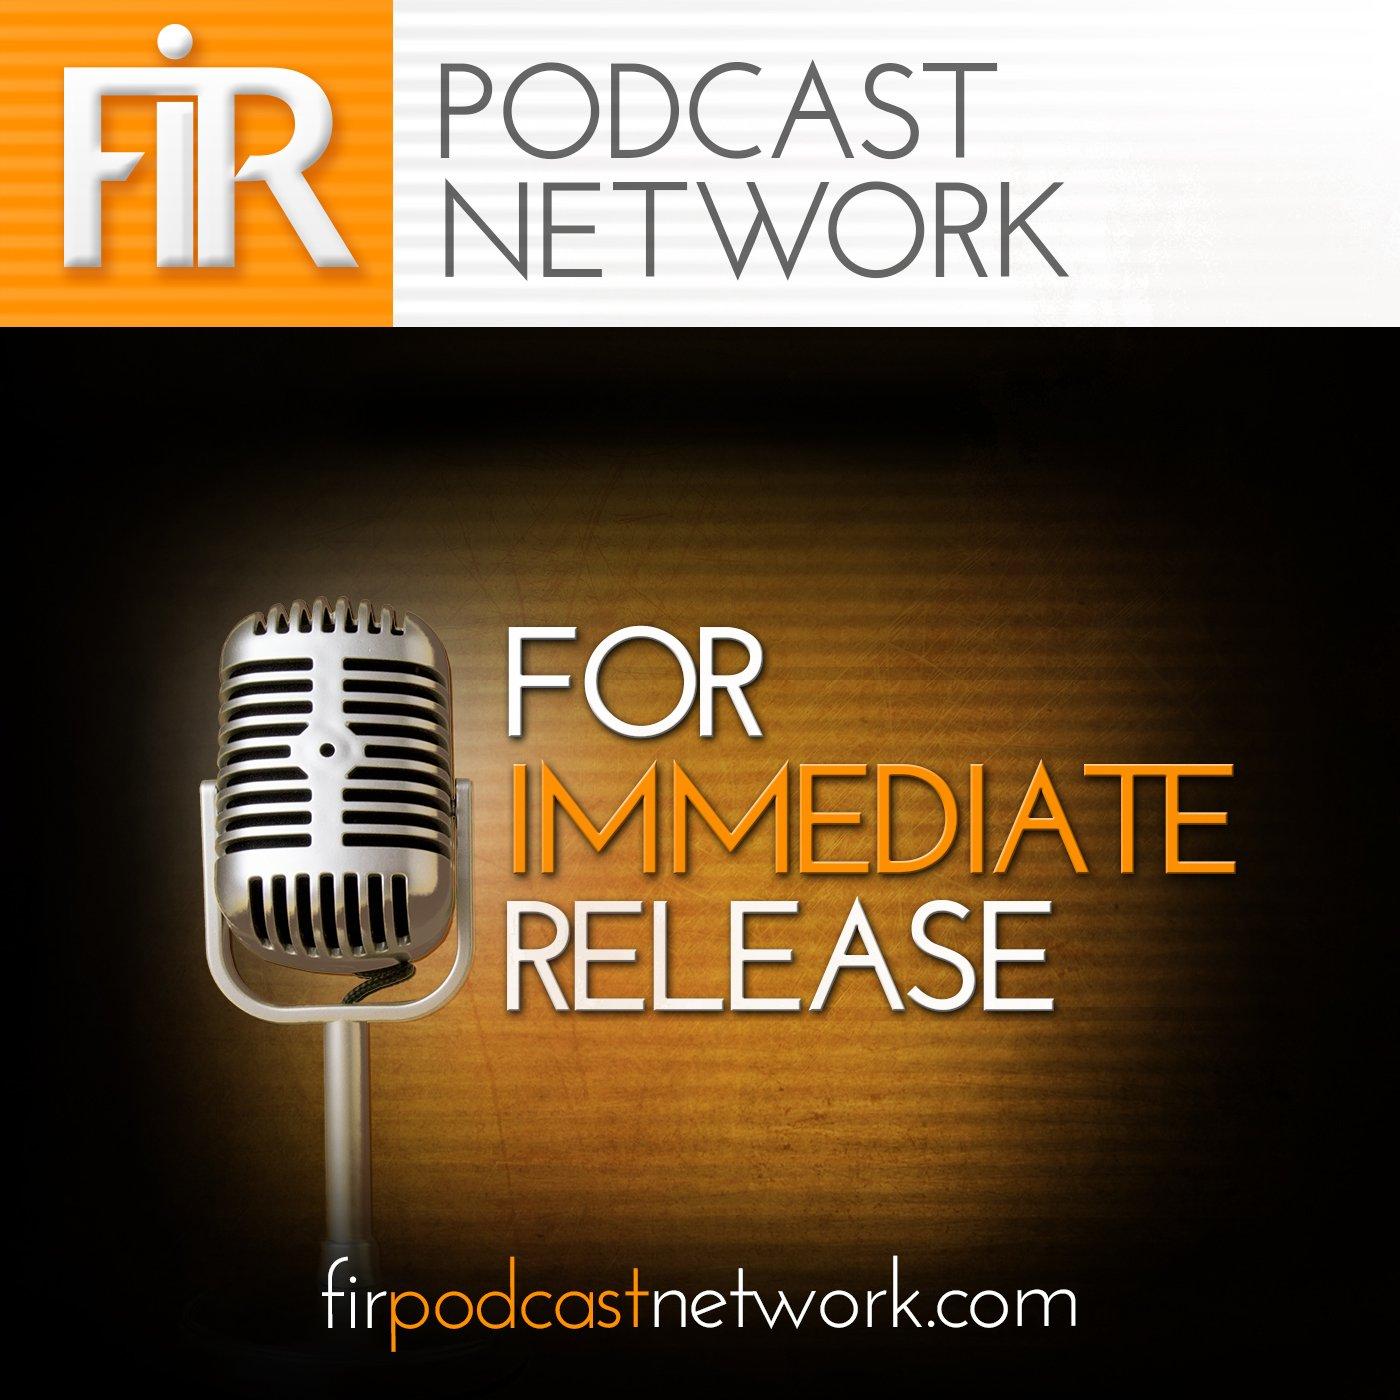 FIR_itunes cover_For_Immediate_Release (1)